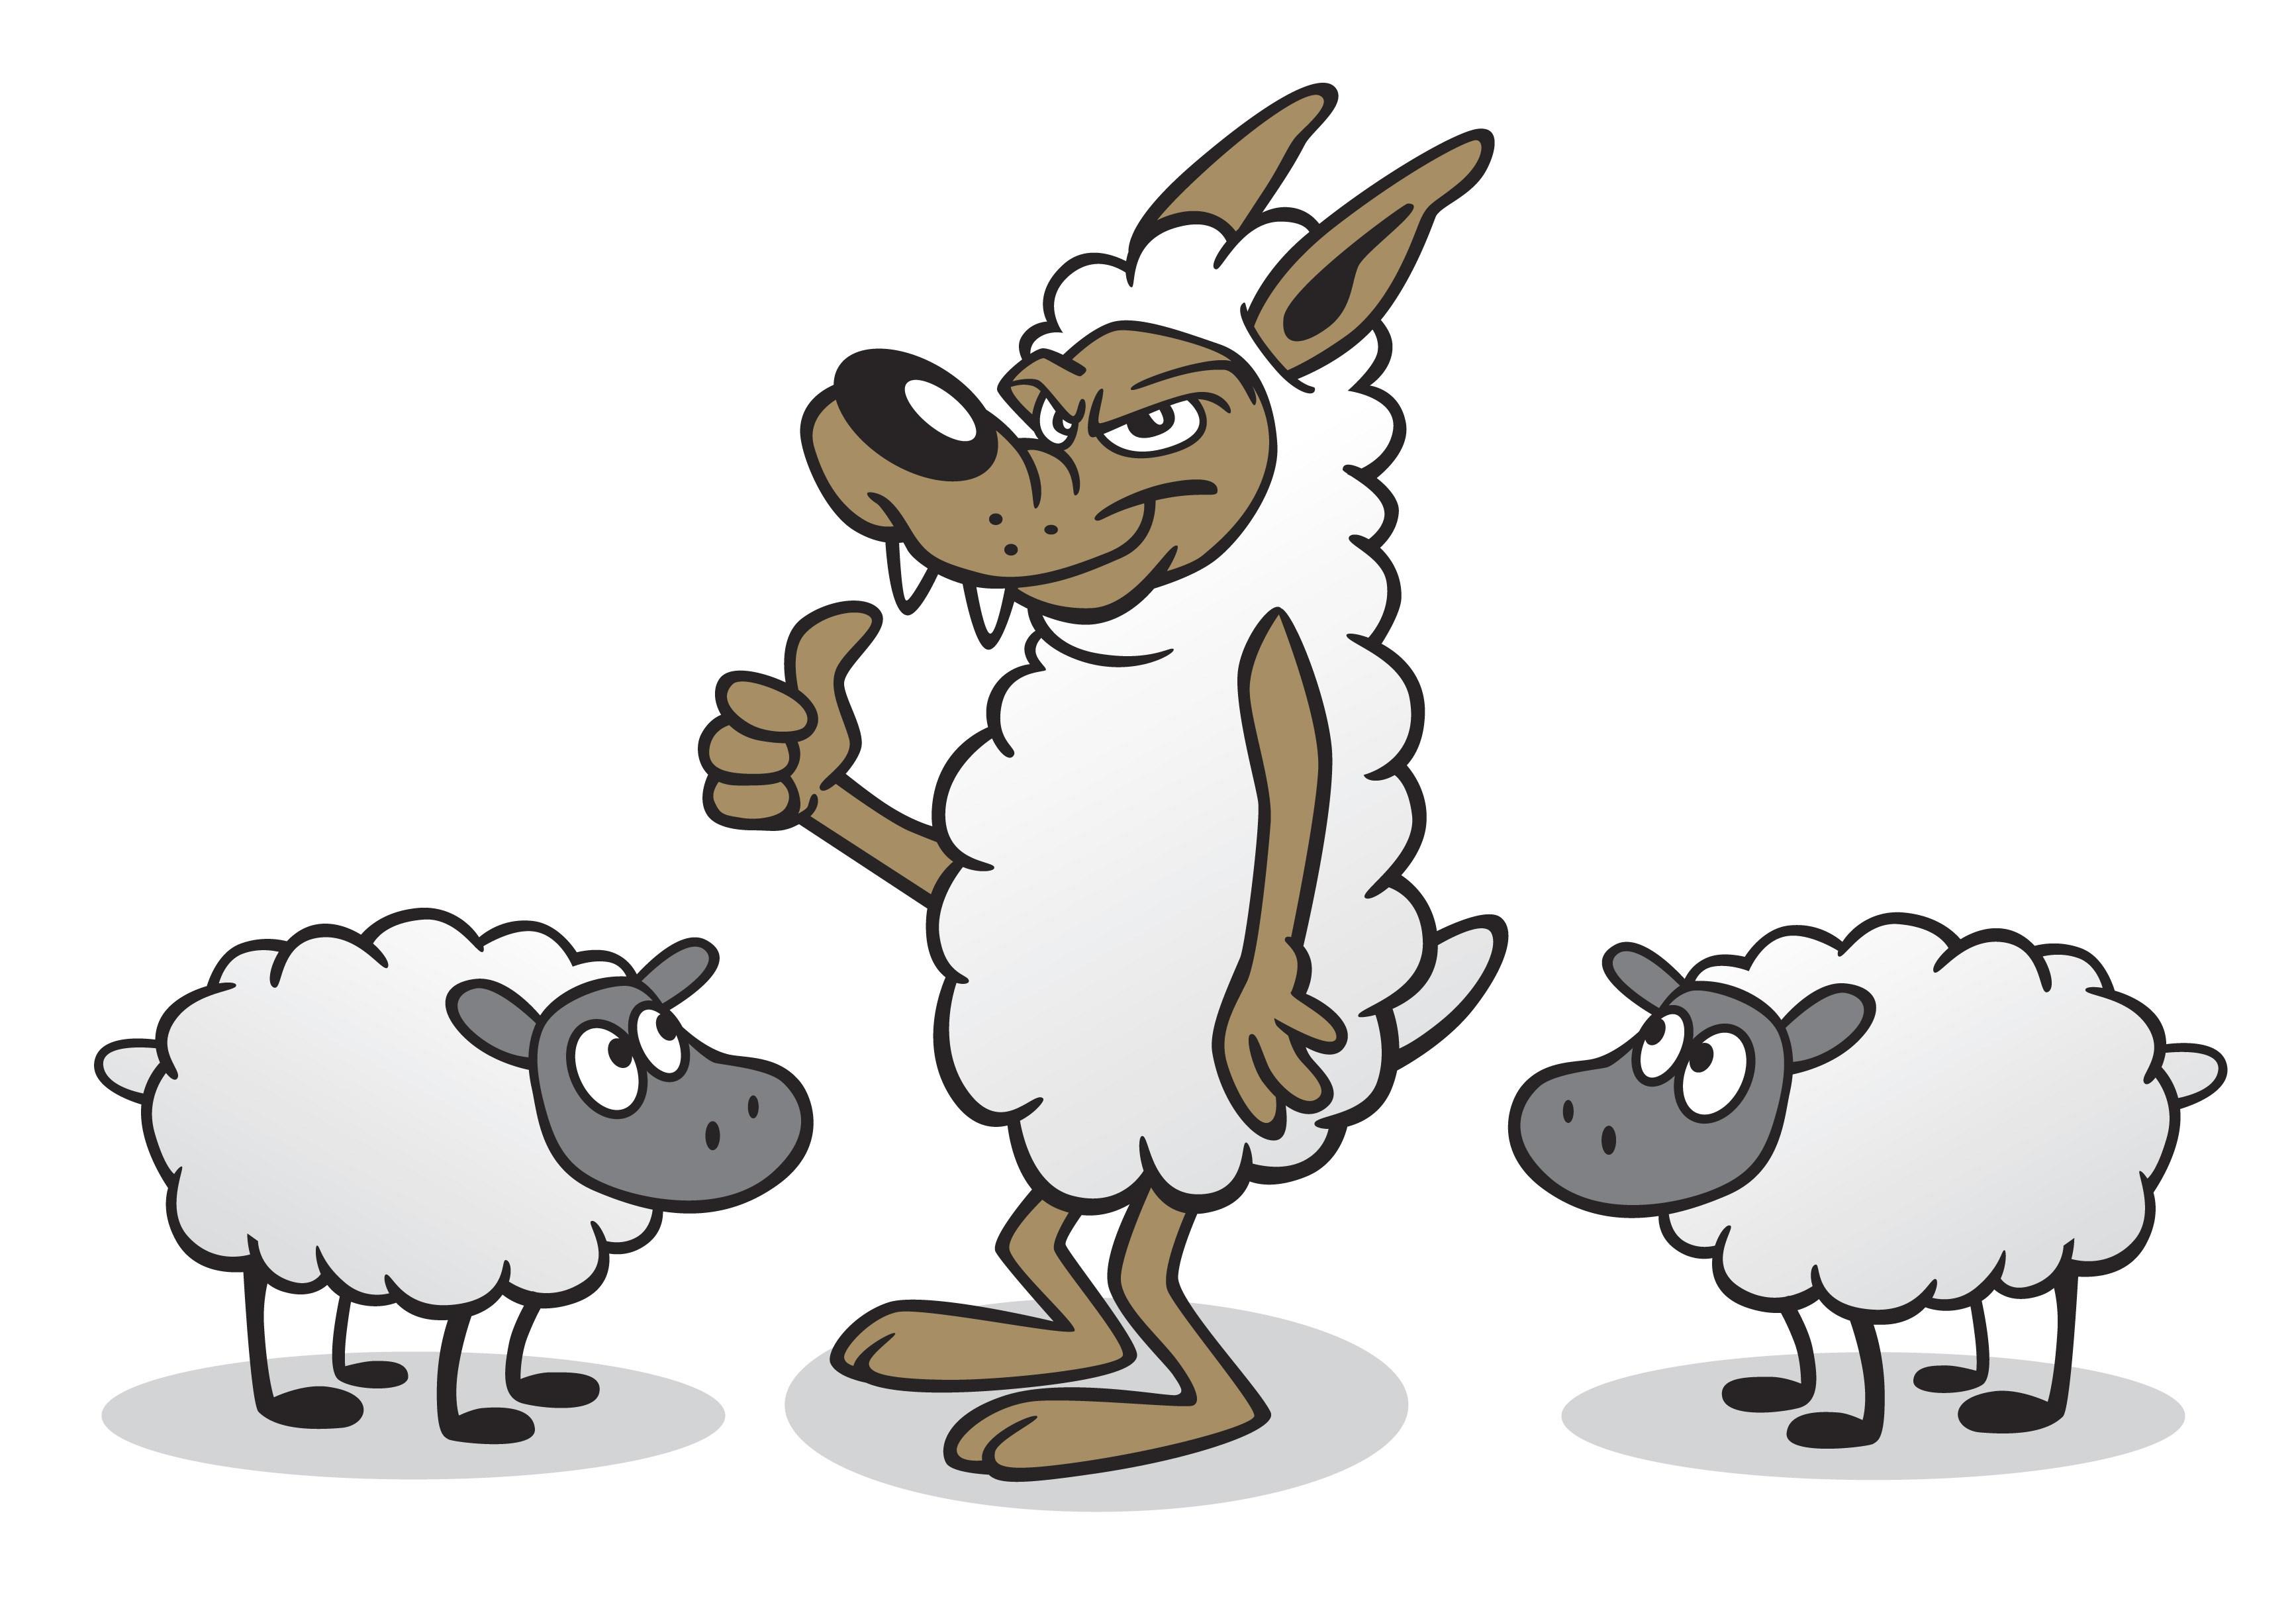 3468x2412 Cartoon Wolf In Sheep Clothing Clip Art 1801525 Misfit Matriarch